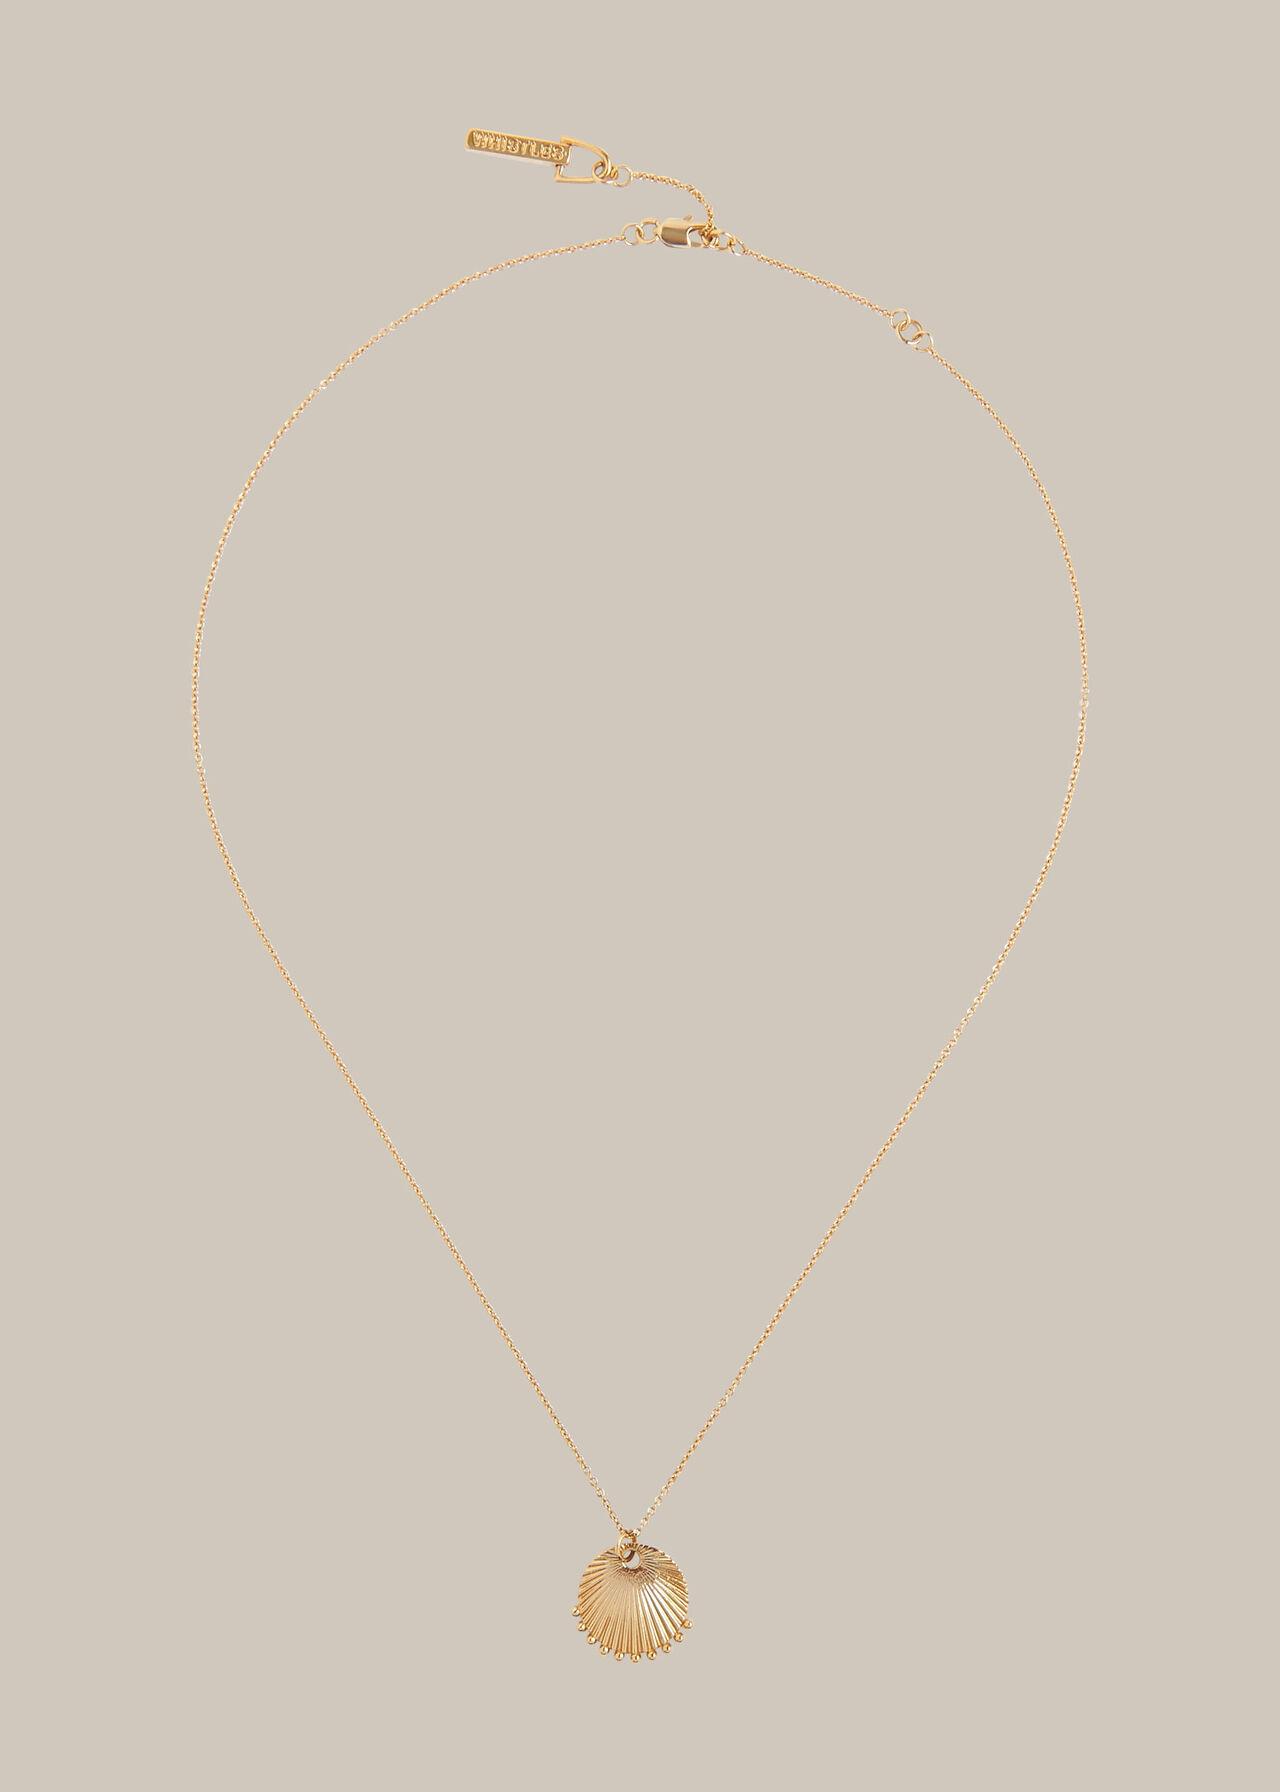 Sunray Pendant Necklace Gold/Multi